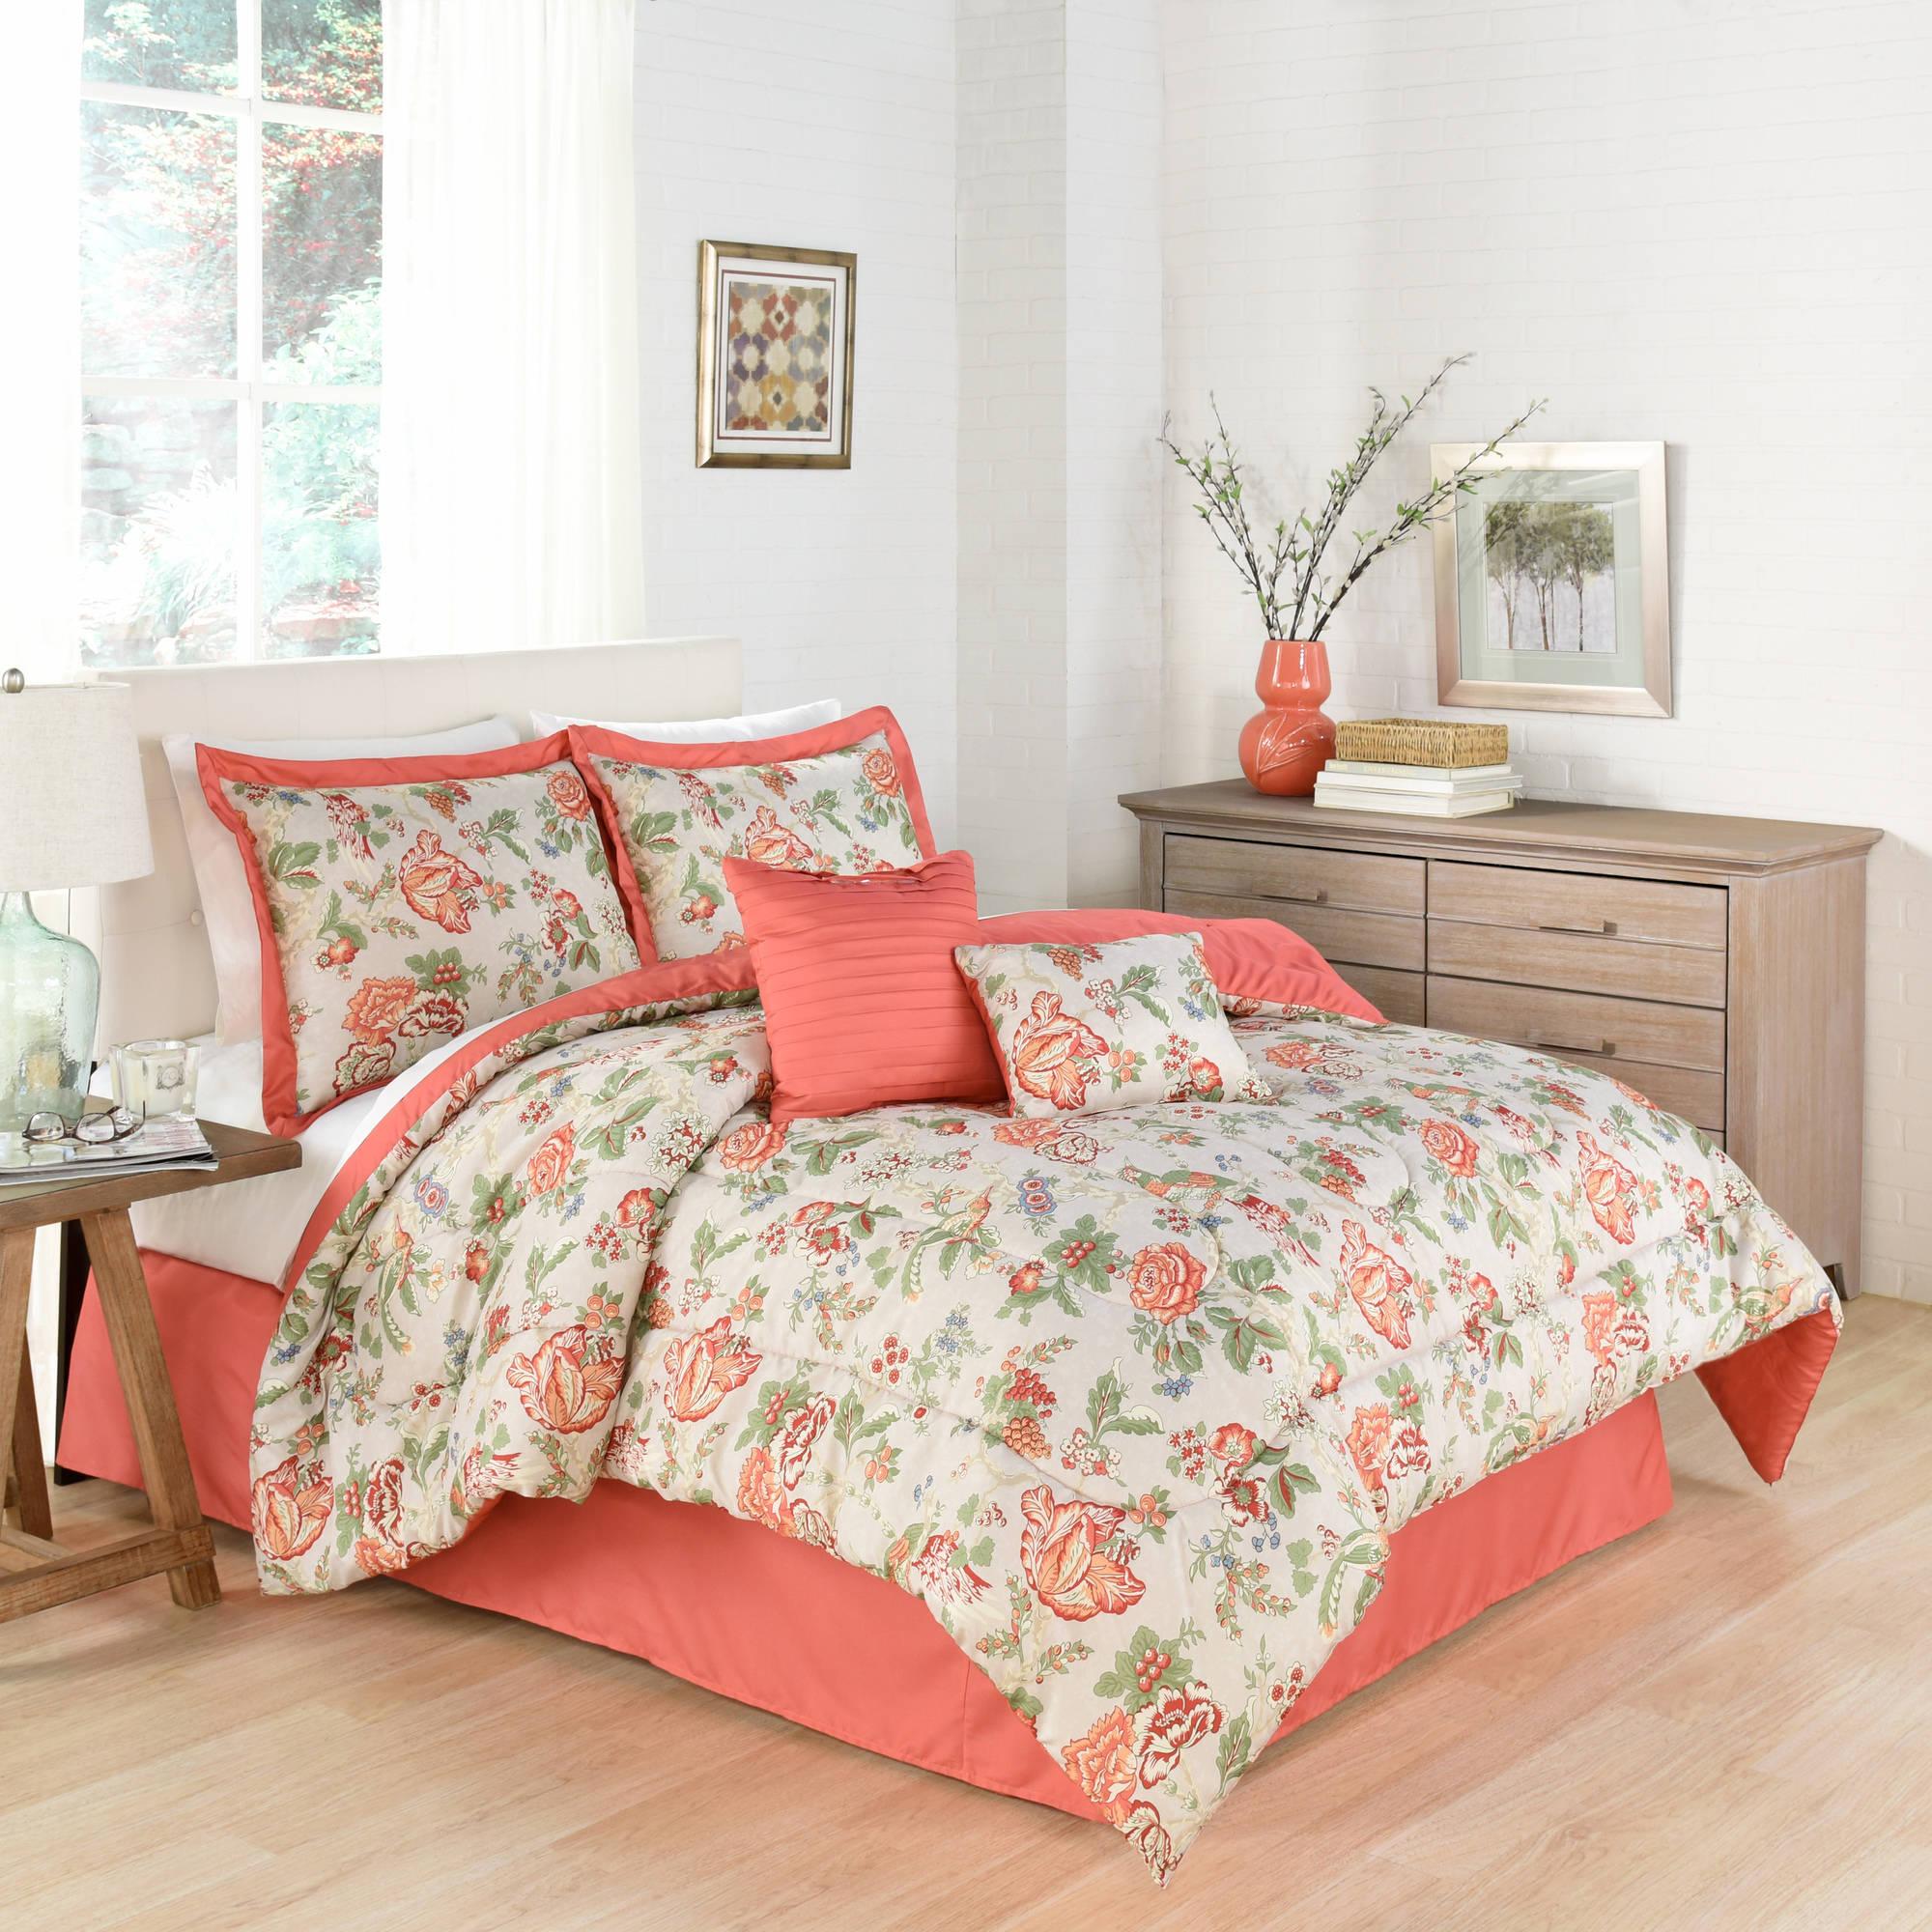 Waverly Traditions Casablanca, 6-Piece Bedding Comforter Collection